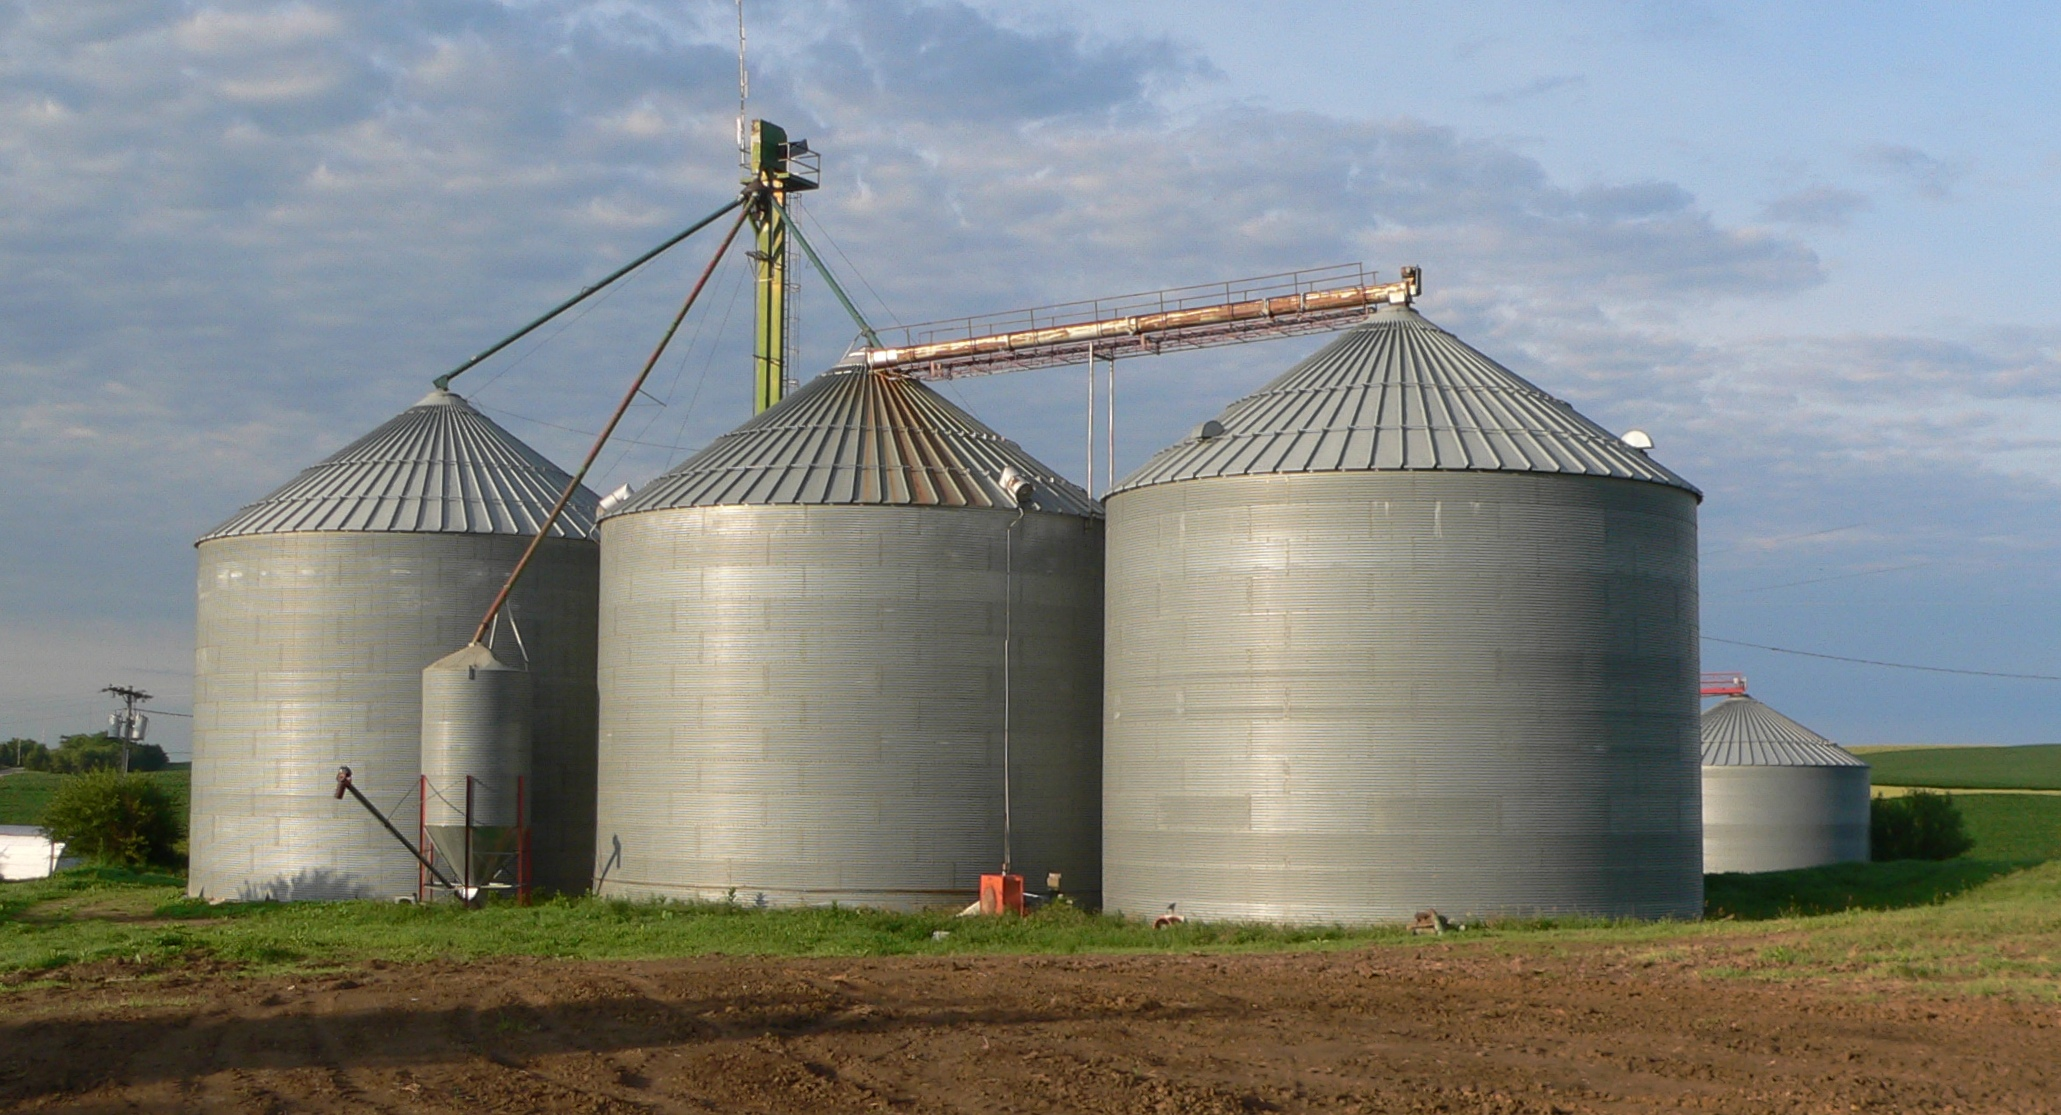 File:Sholes, Nebraska grain bins 1.JPG - Wikimedia Commons